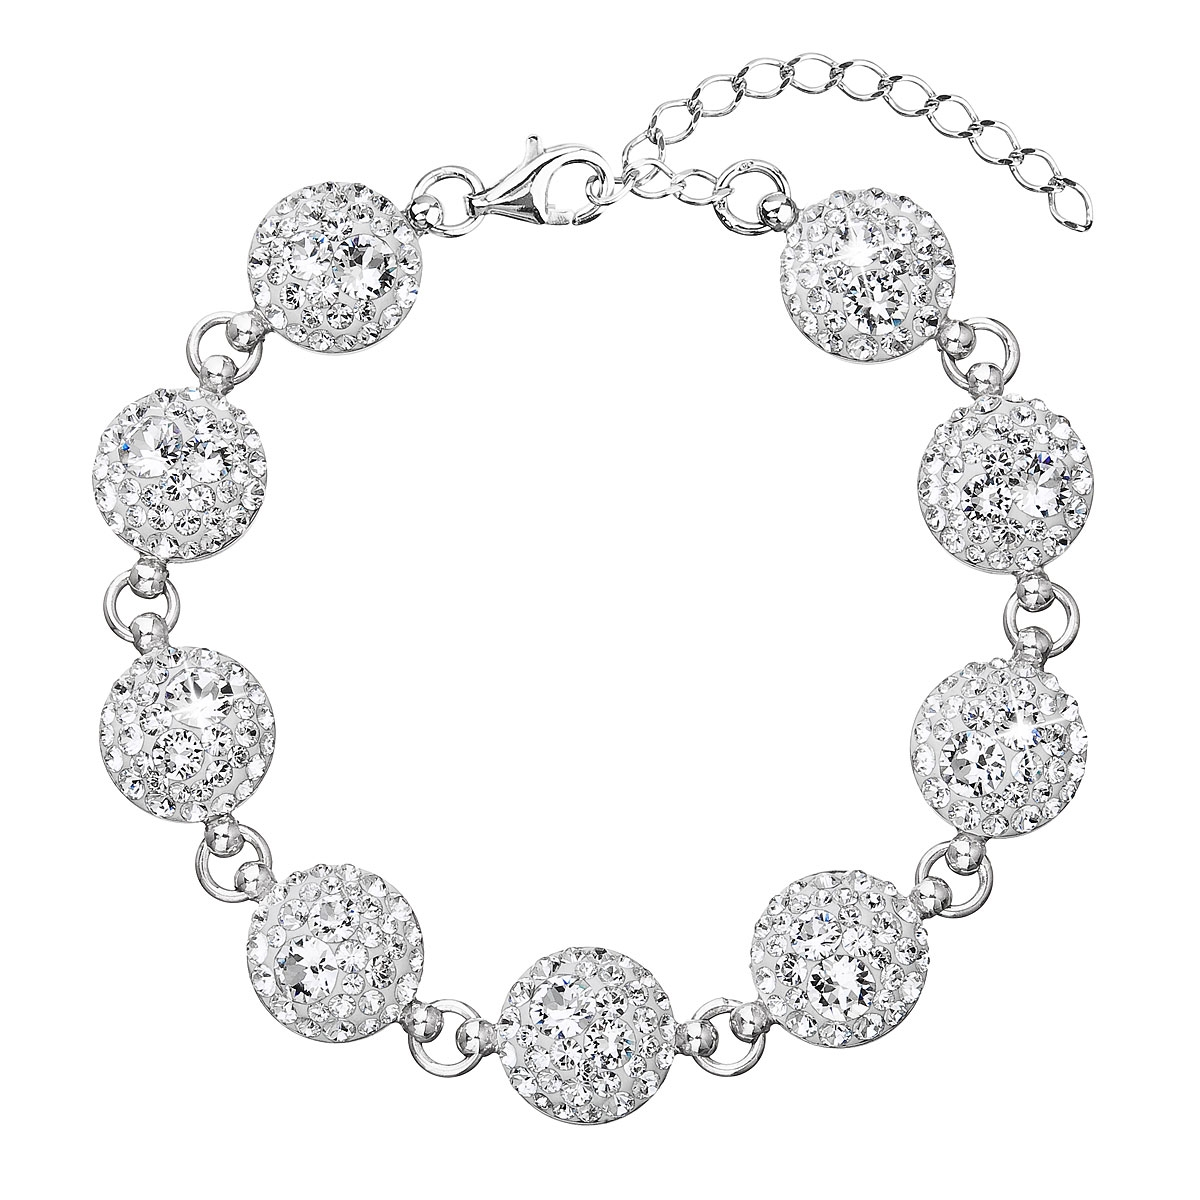 Stříbrný náramek s krystaly Crystals from Swarovski®, Crystal EG7004-CR